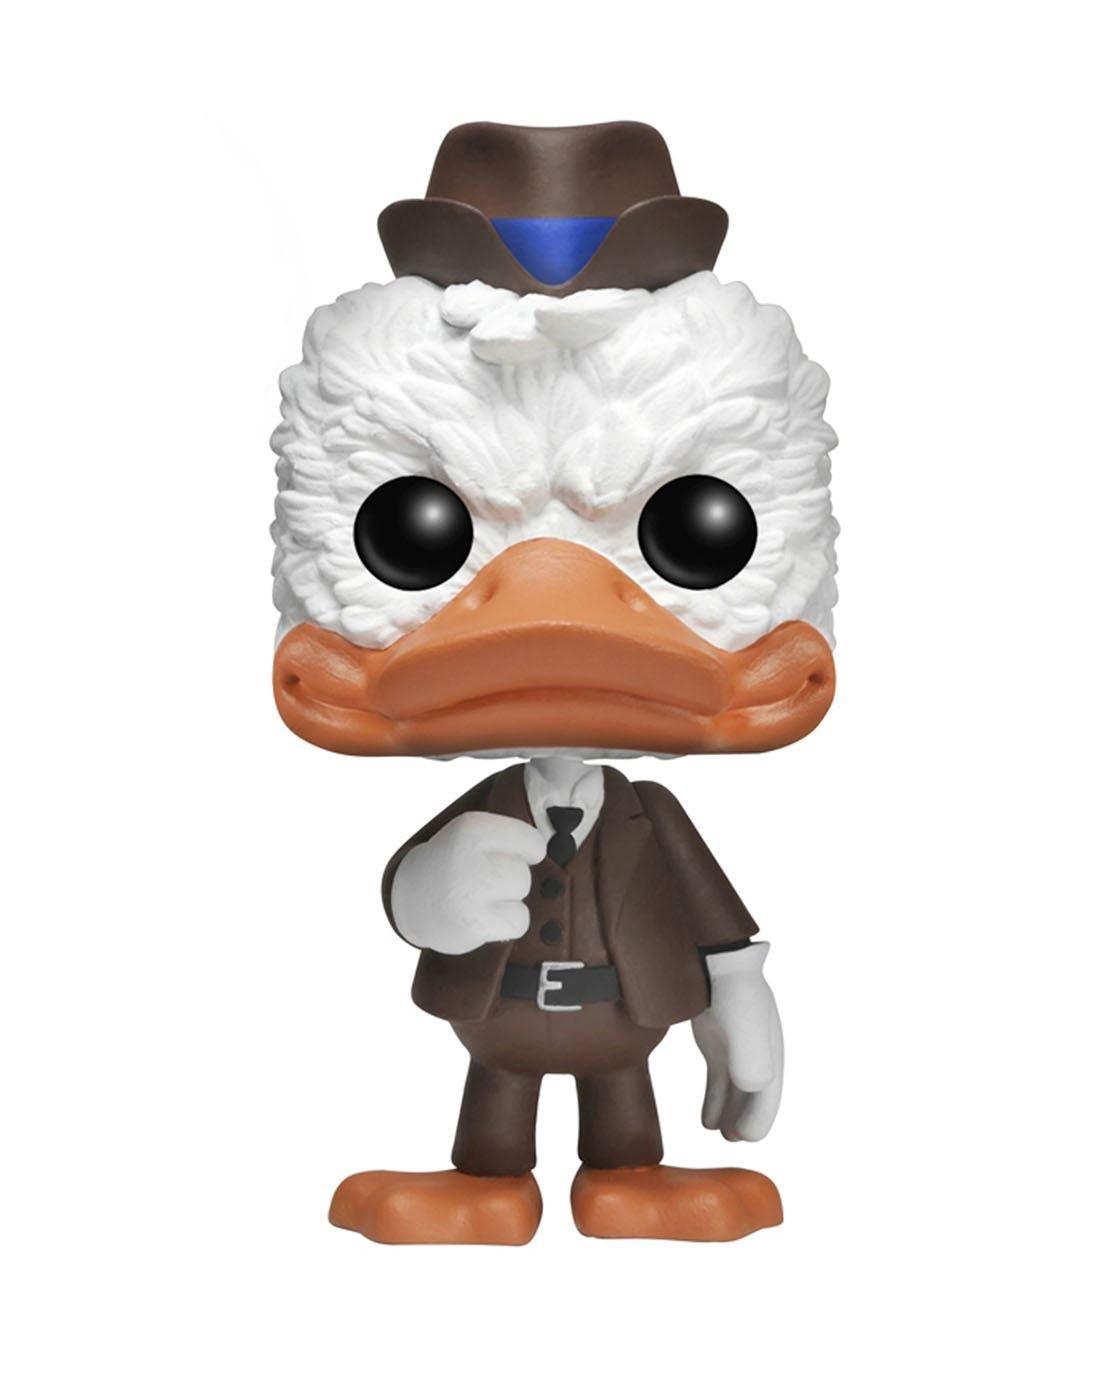 Funko Pop! Guardians Of The Galaxy Howard The Duck Vinyl Bobble Head Figure